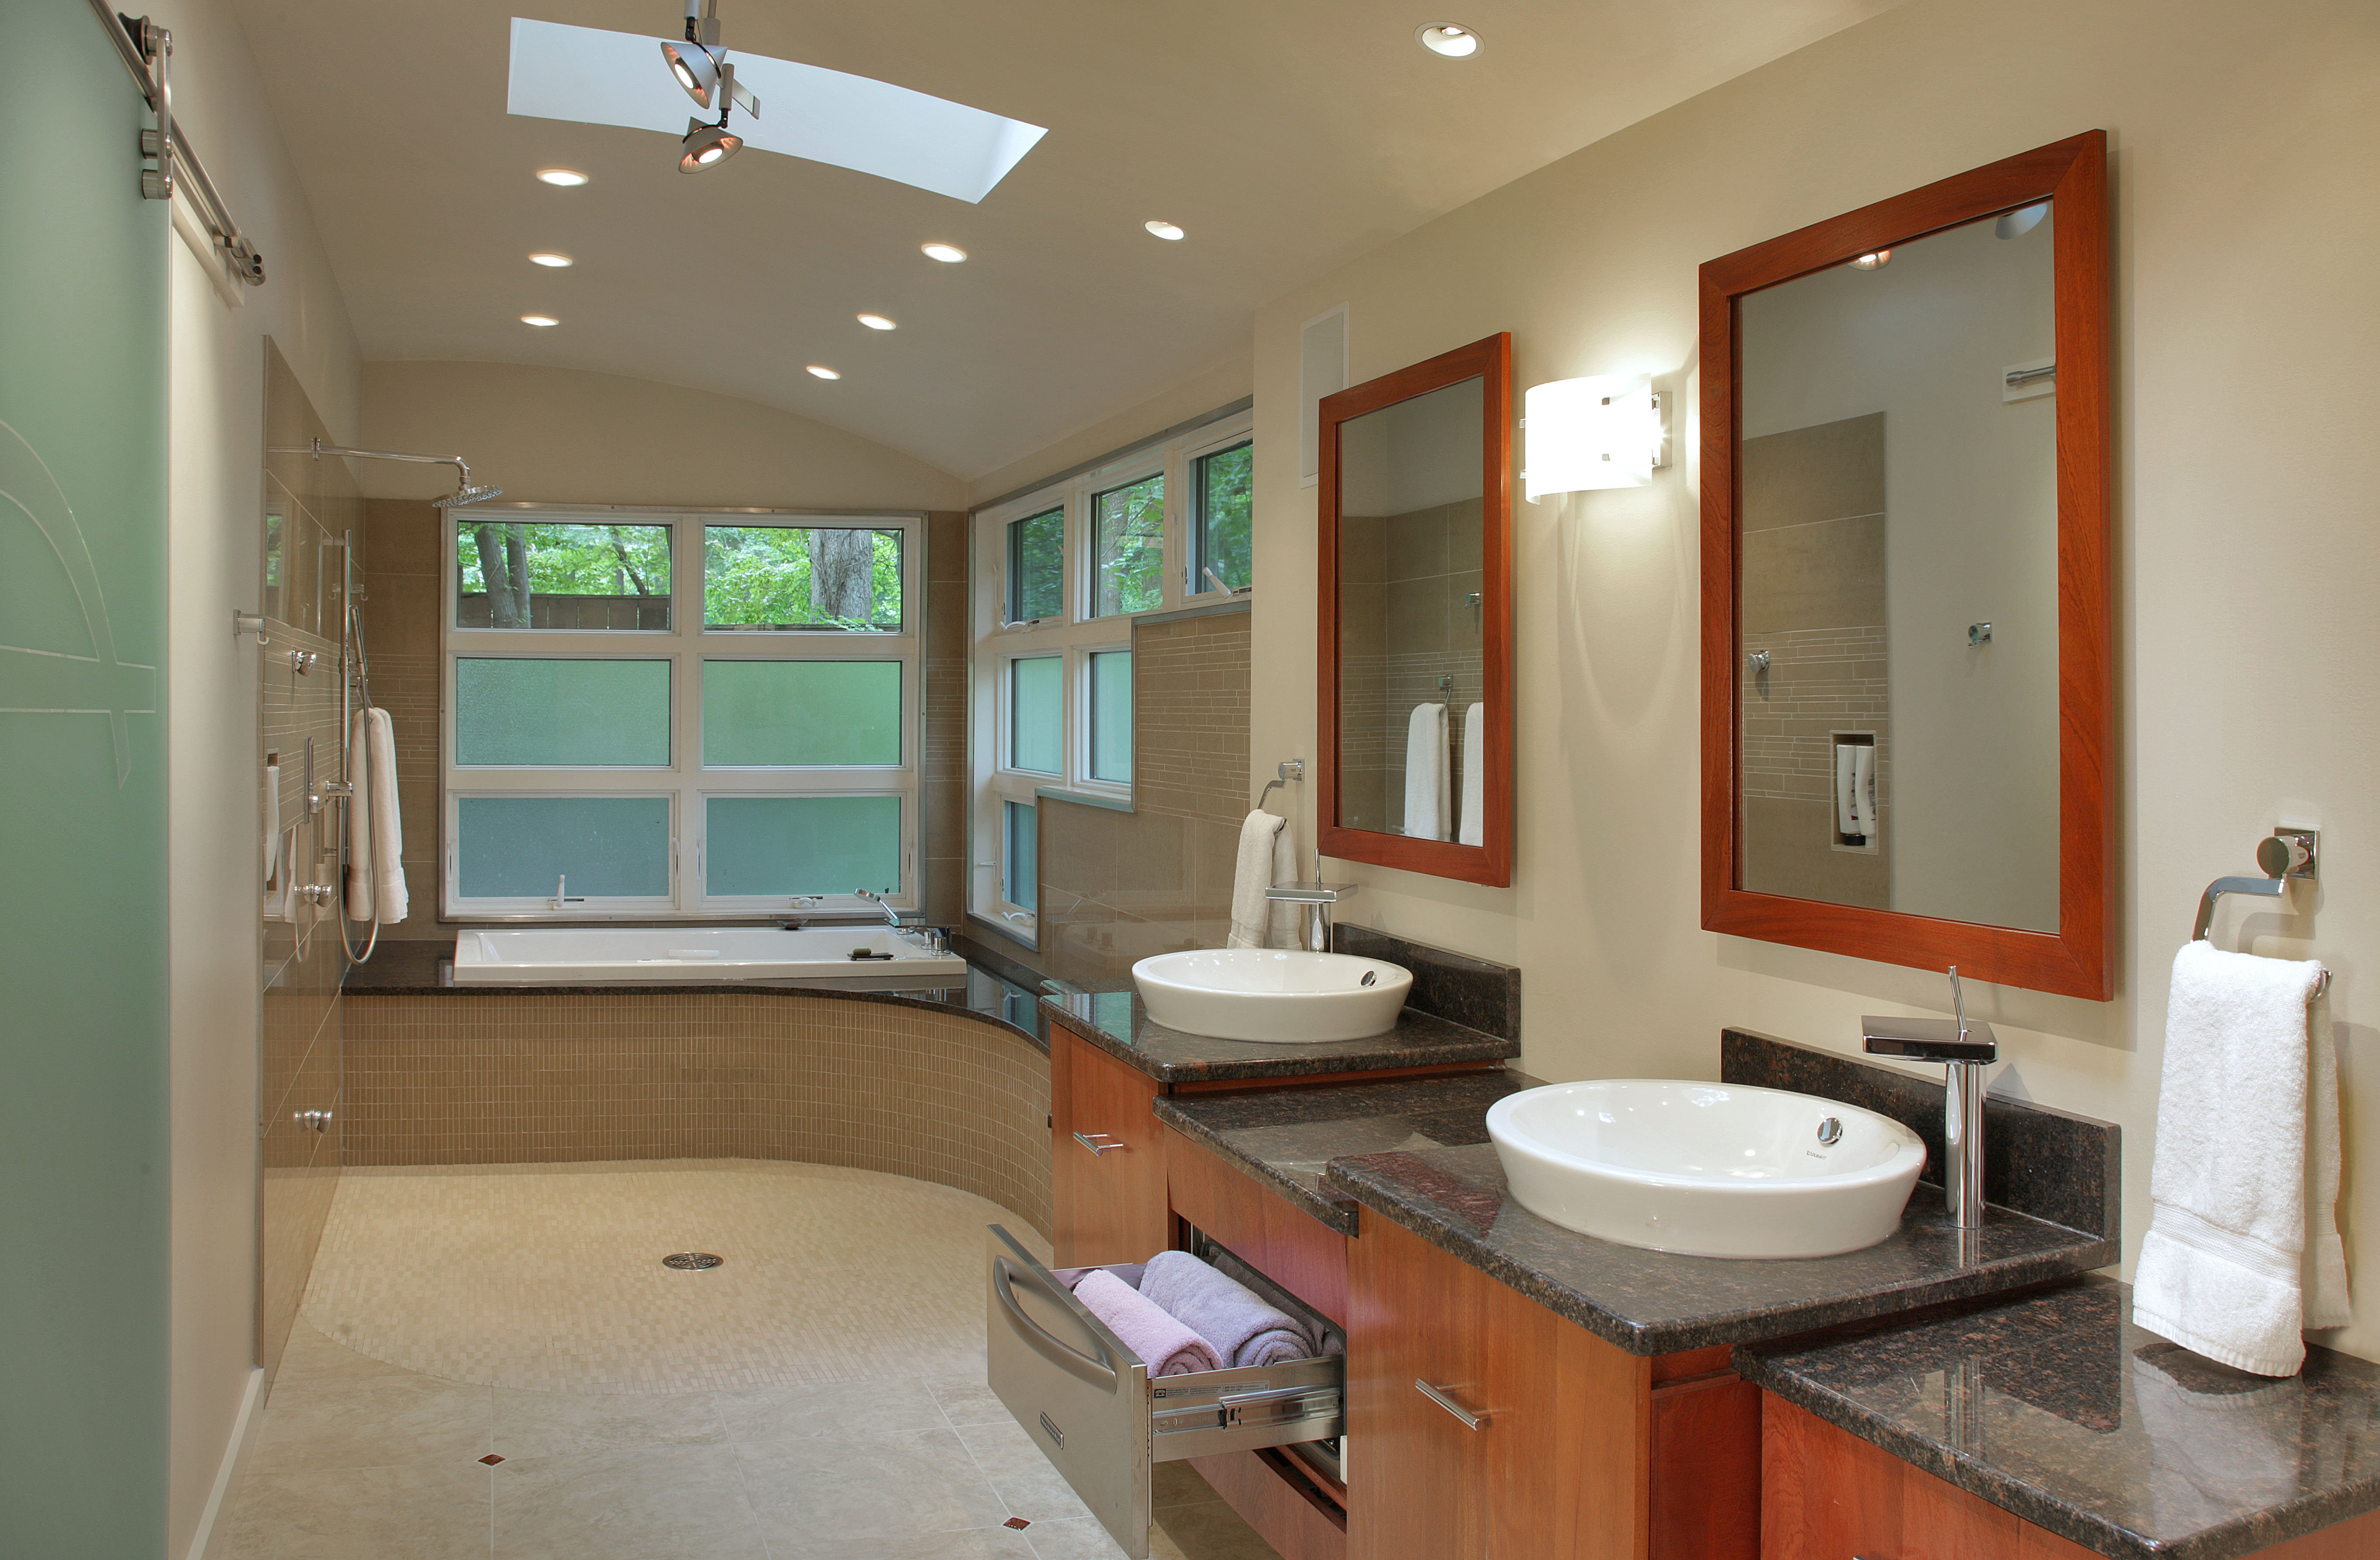 Long View of Bathroom